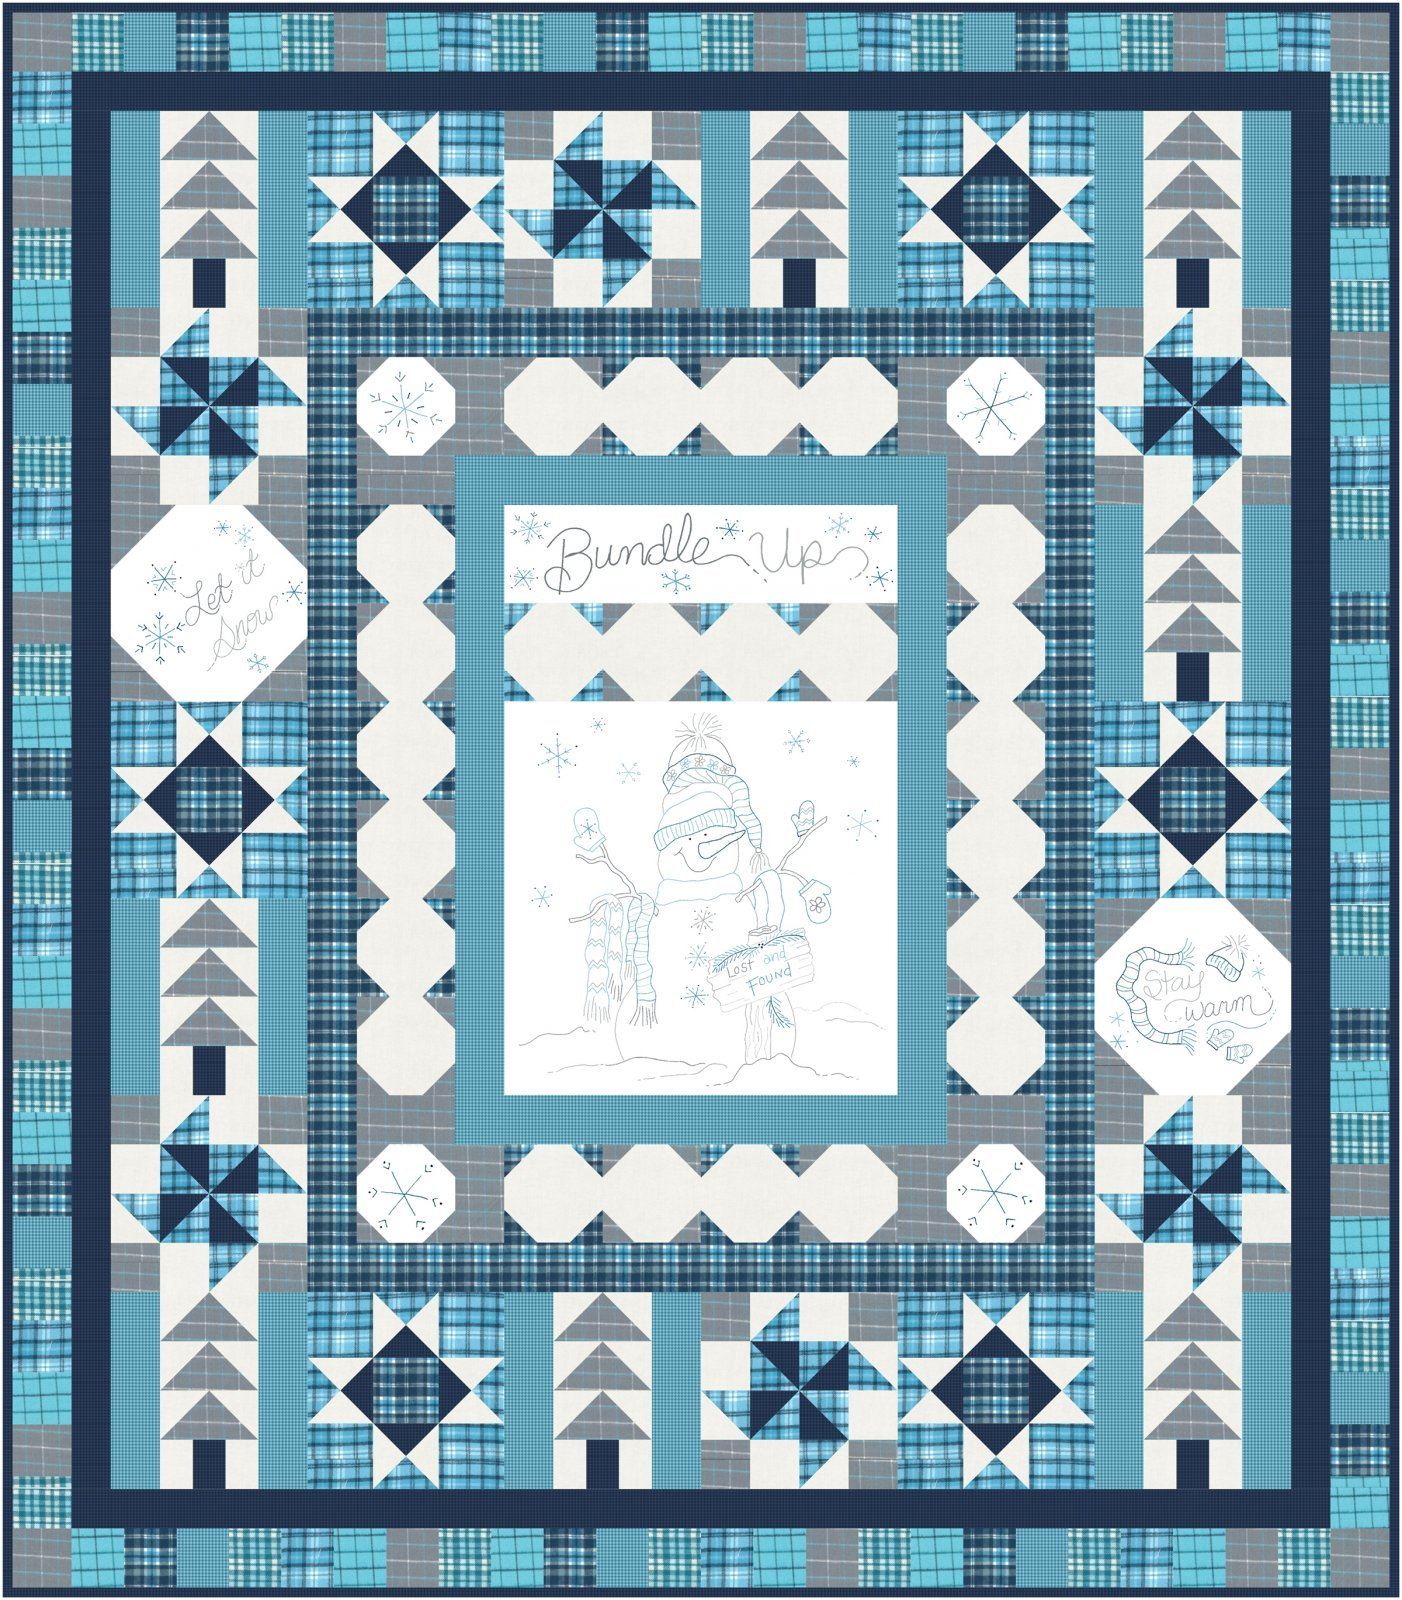 Bundle Up Complete Quilt Kit by Cindy Staub of Quilt Doodle Designs